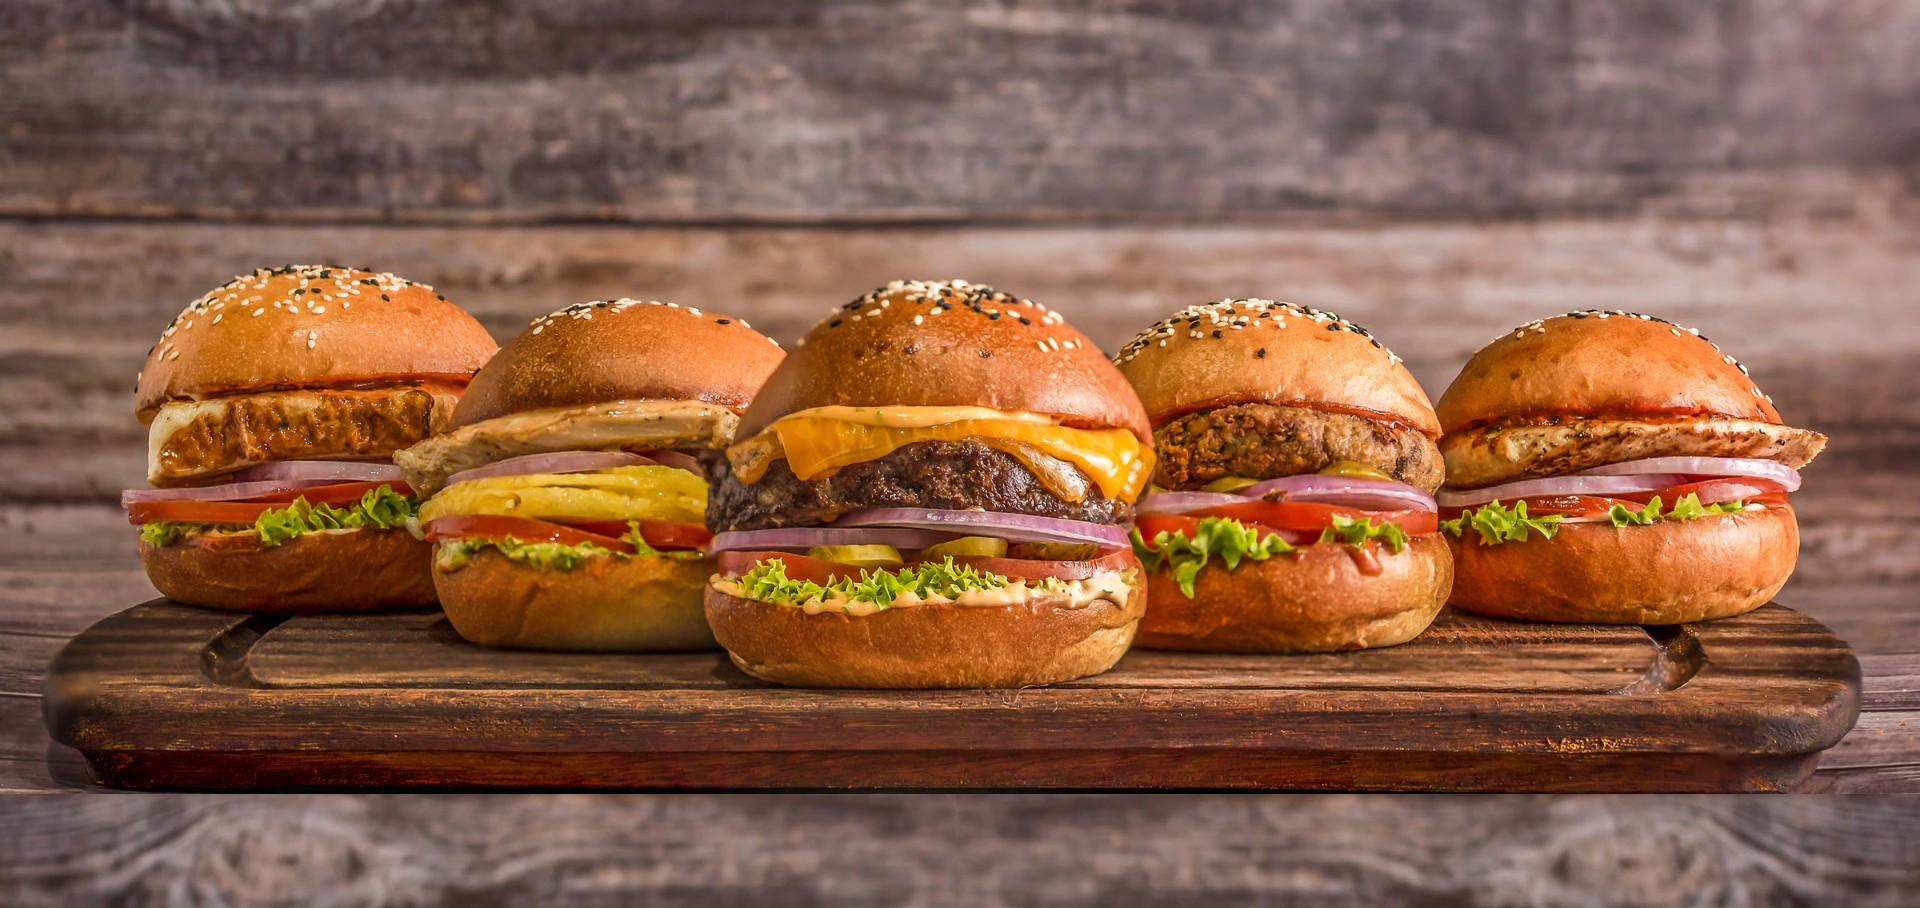 image de burgers